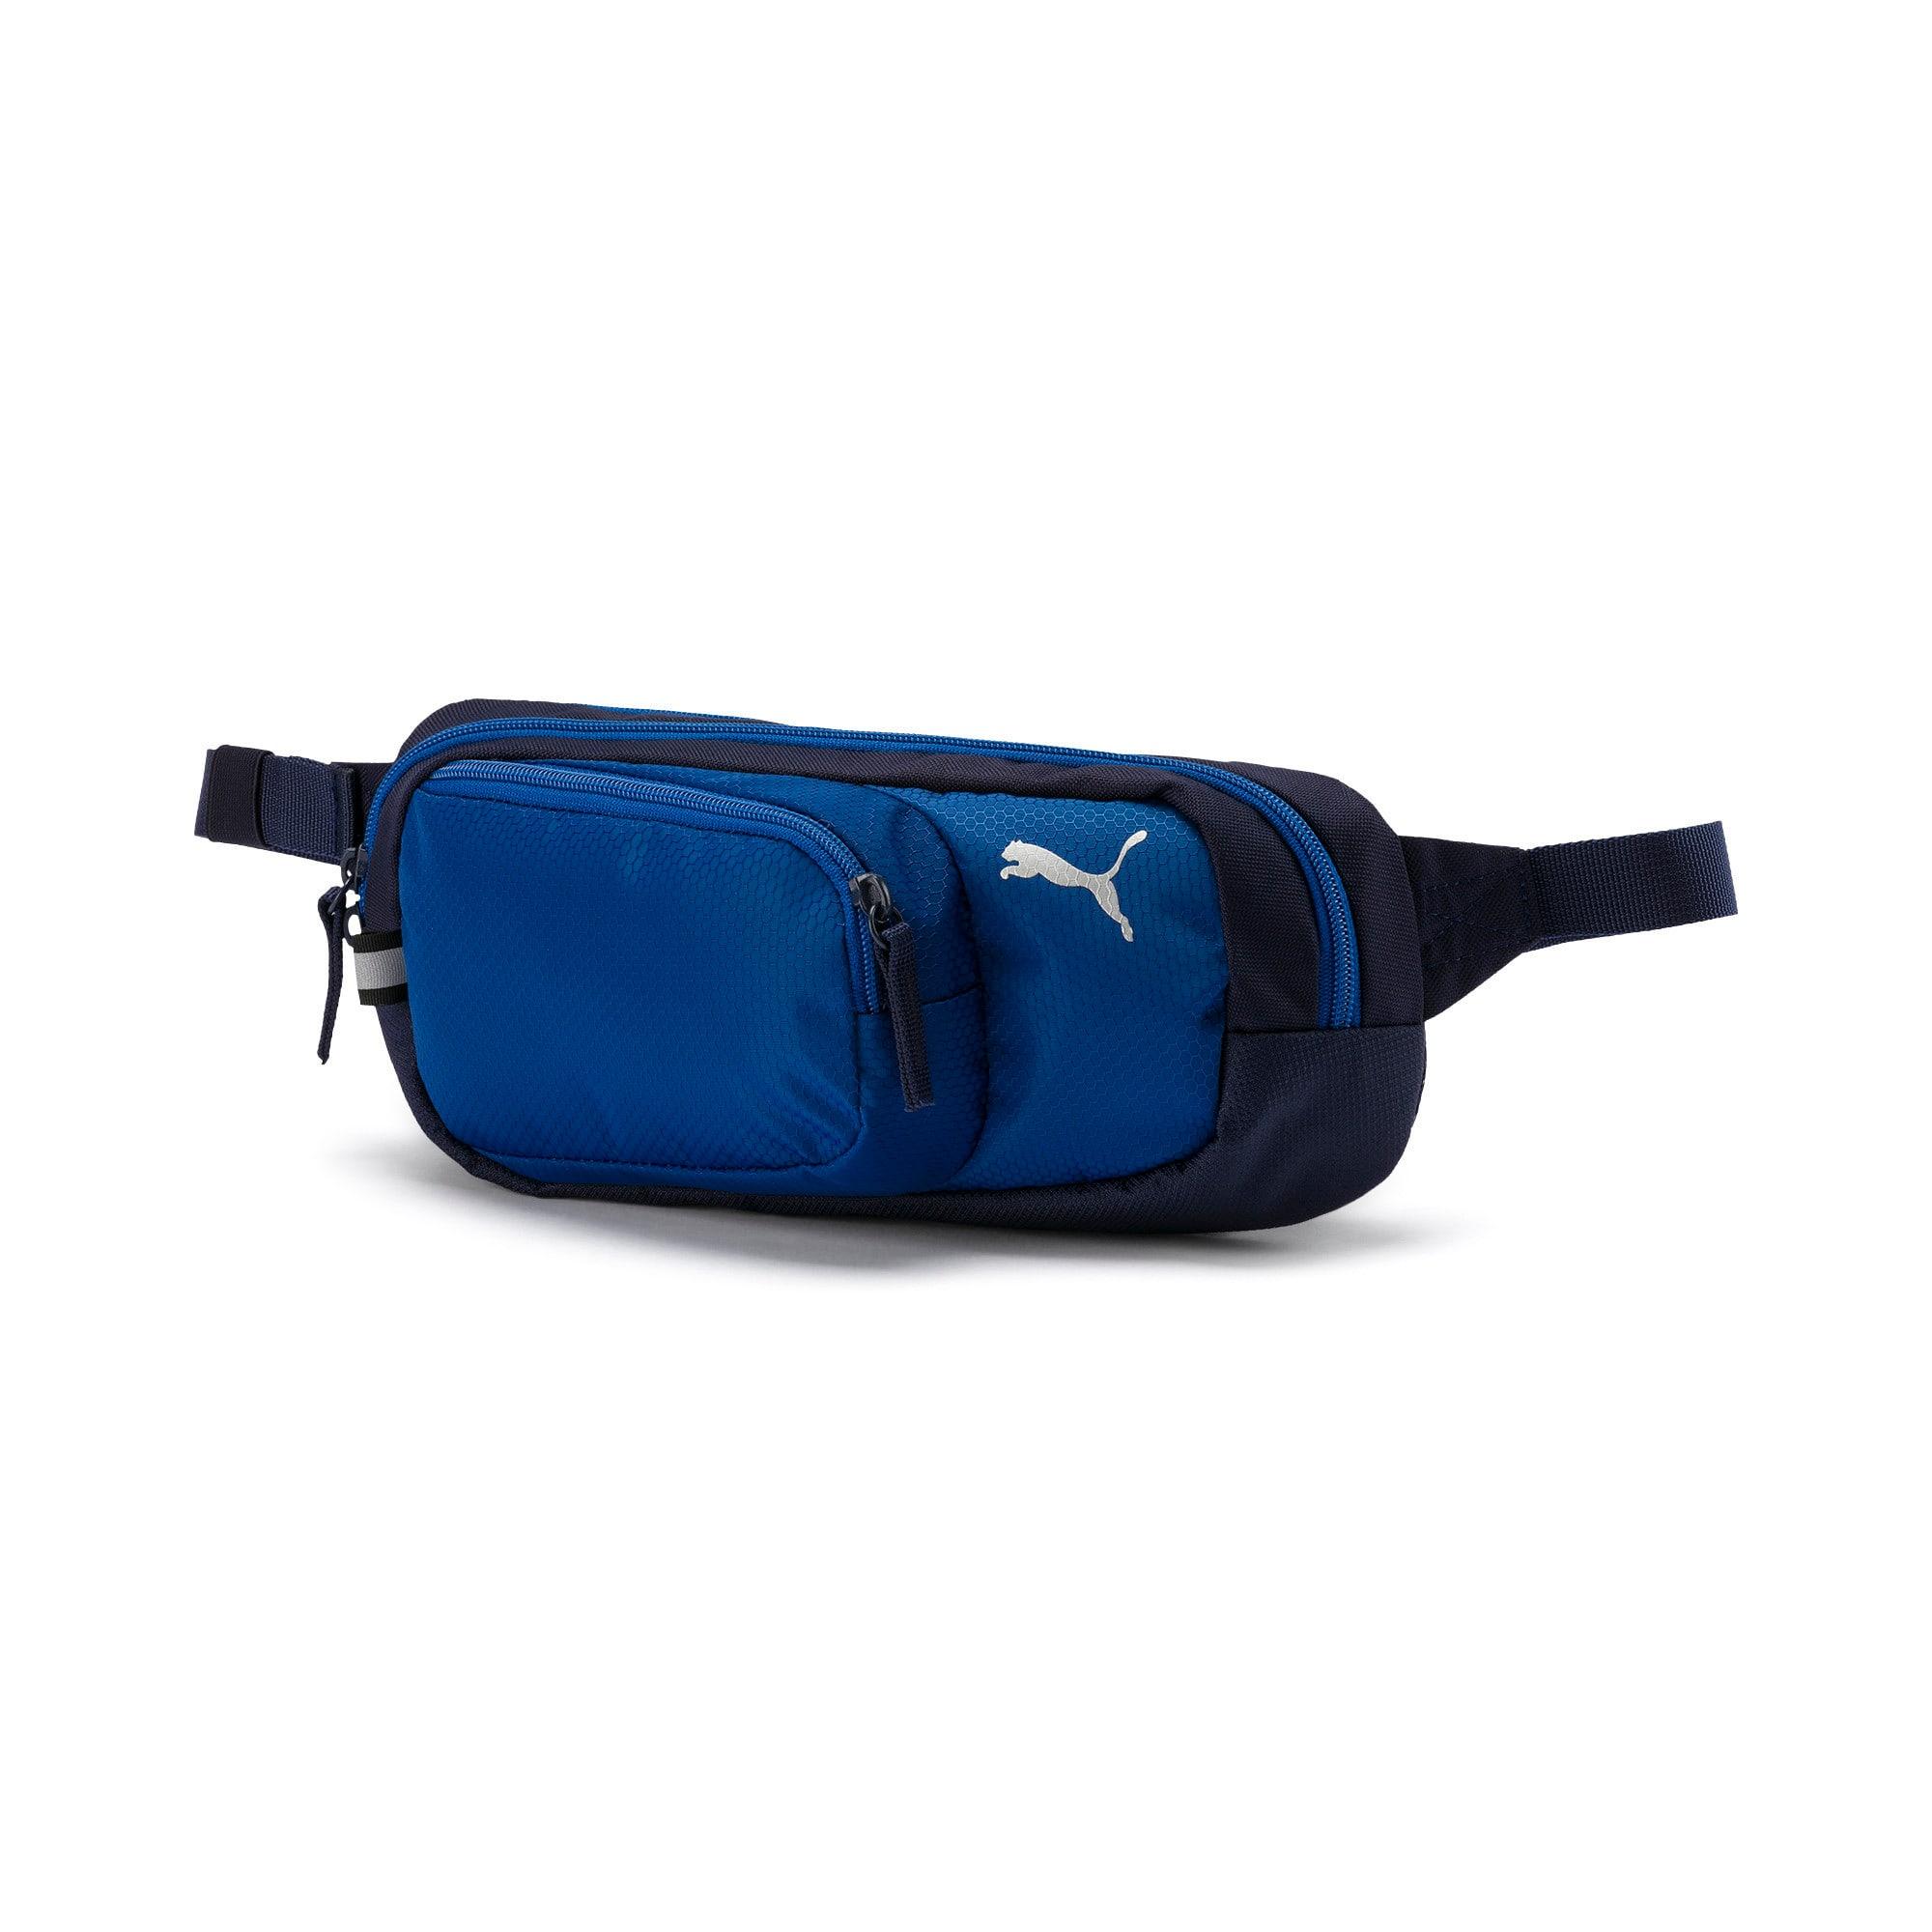 Miniatura 1 de Bolso pequeño para cintura PUMA X Multi, Peacoat-Galaxy Blue, mediano